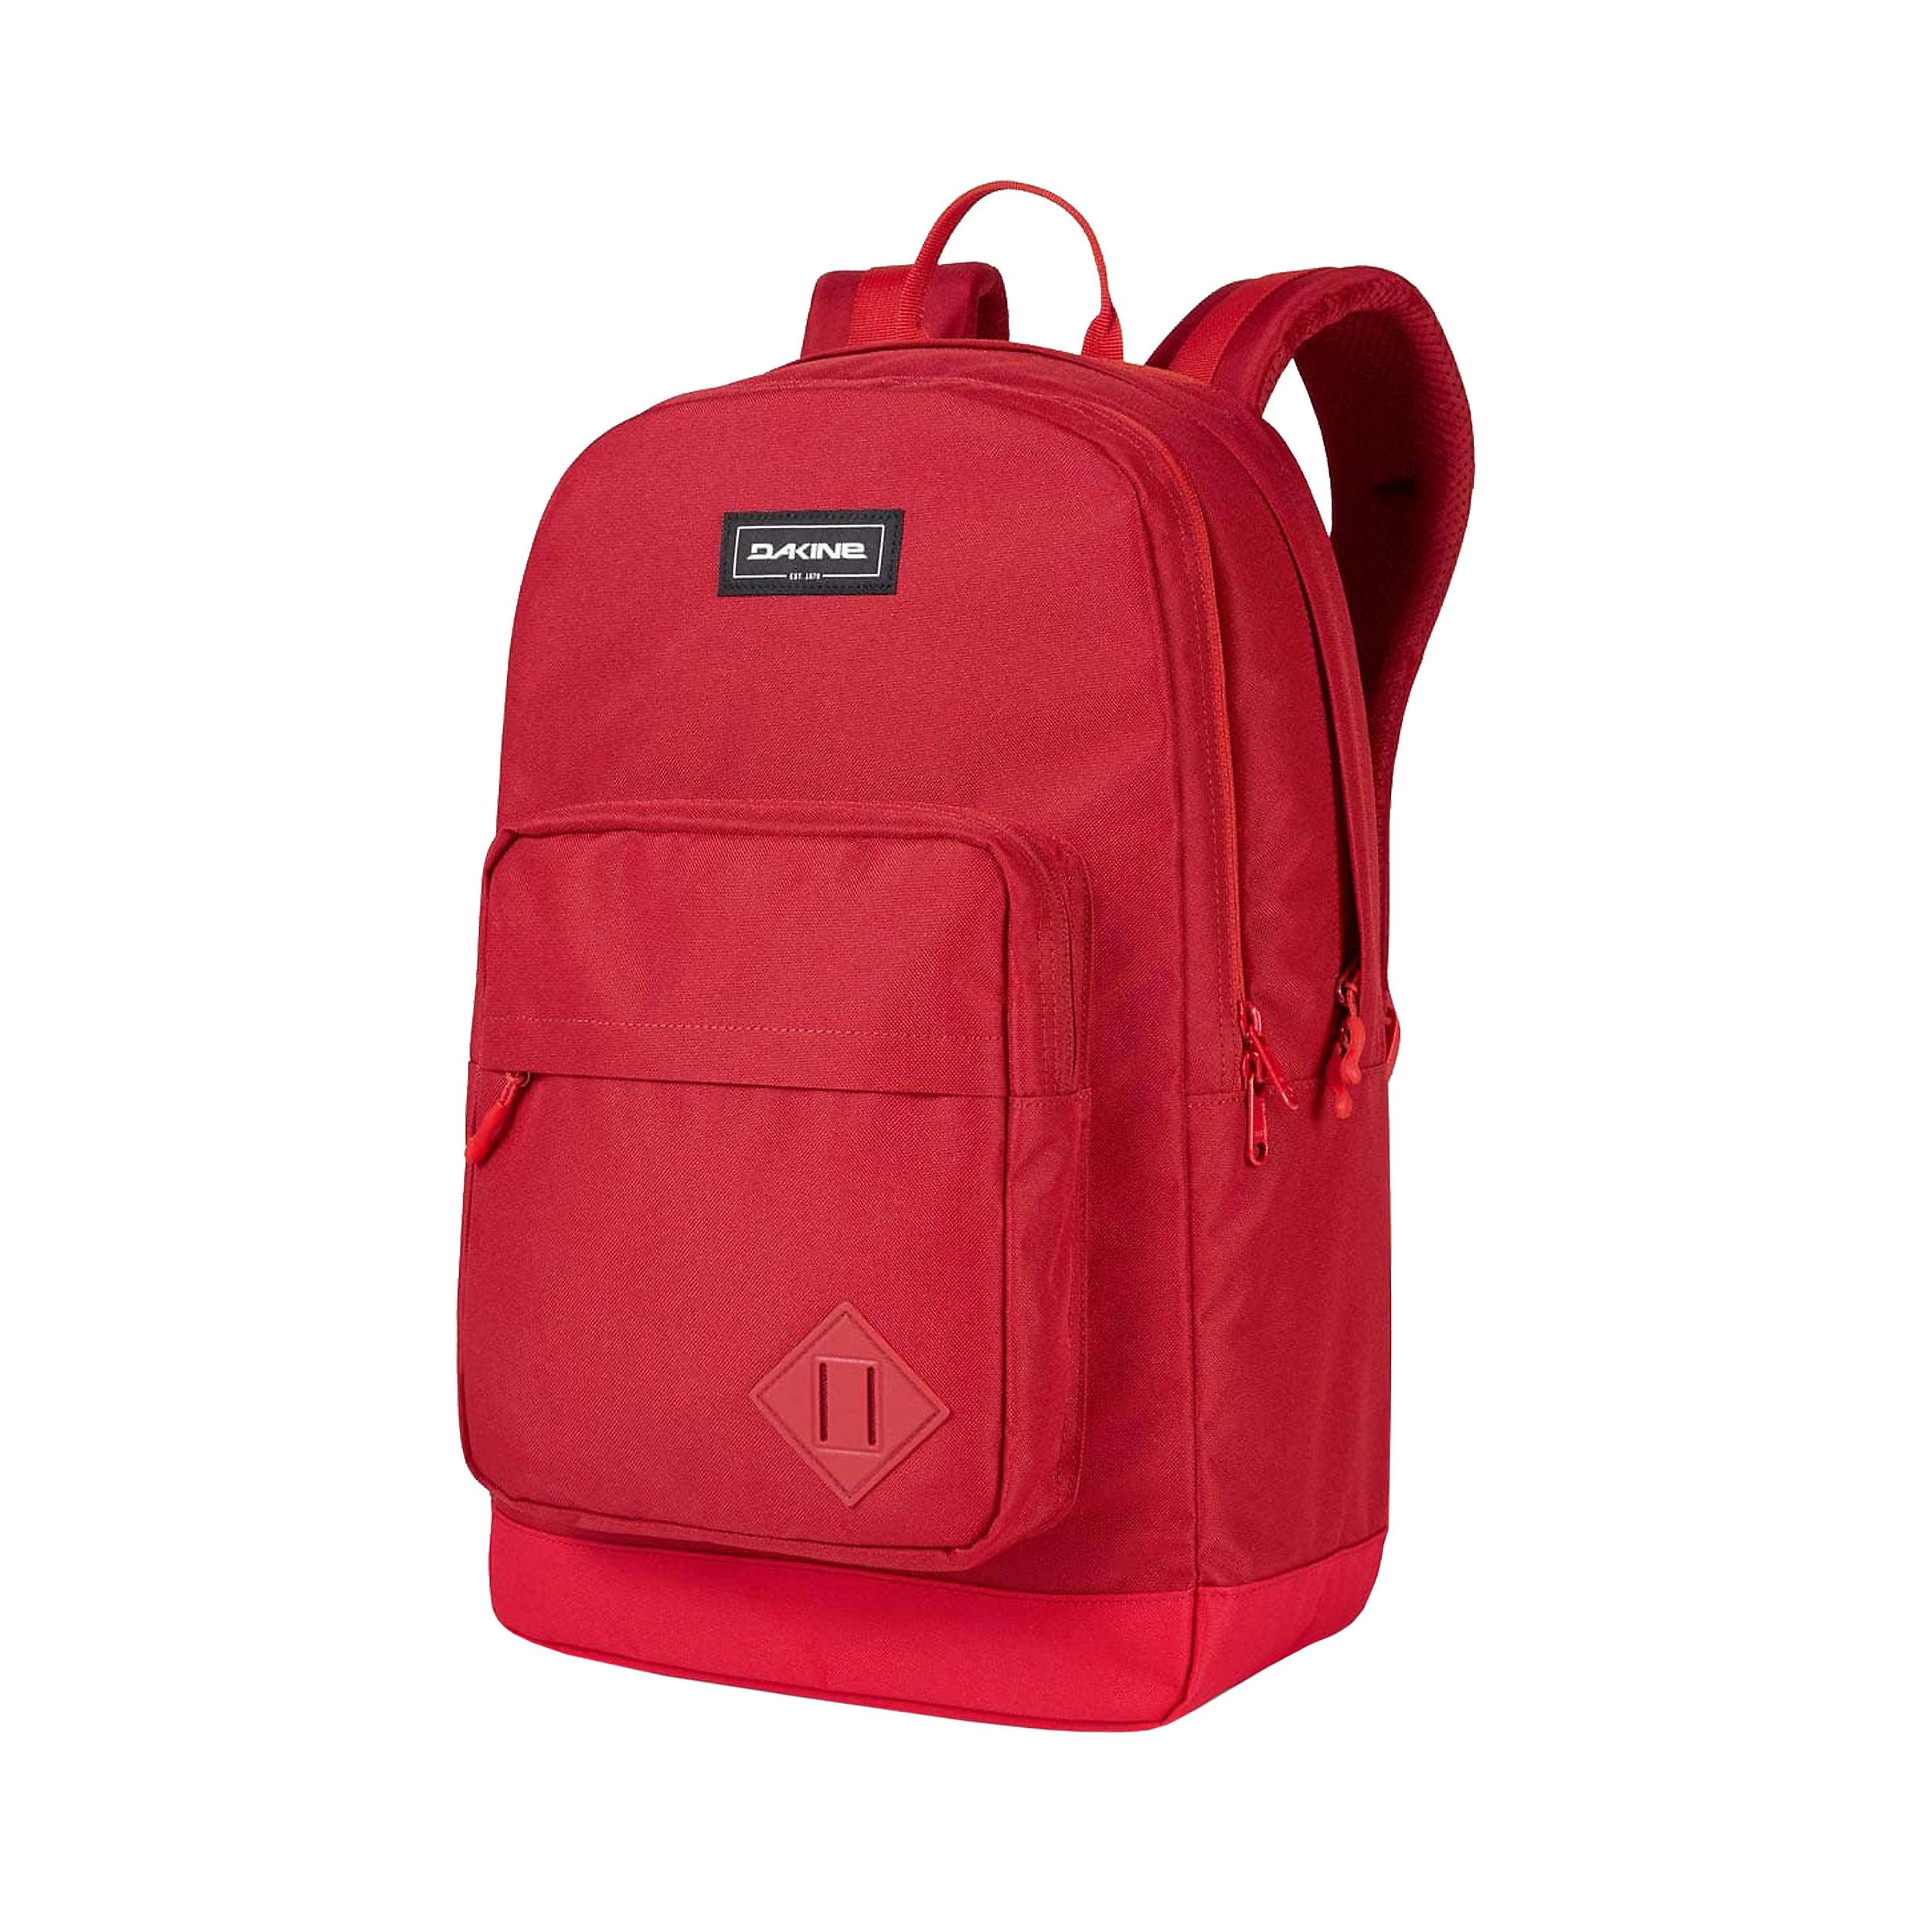 "Backpack 365 Pack DLX 27L 15"" Packs"